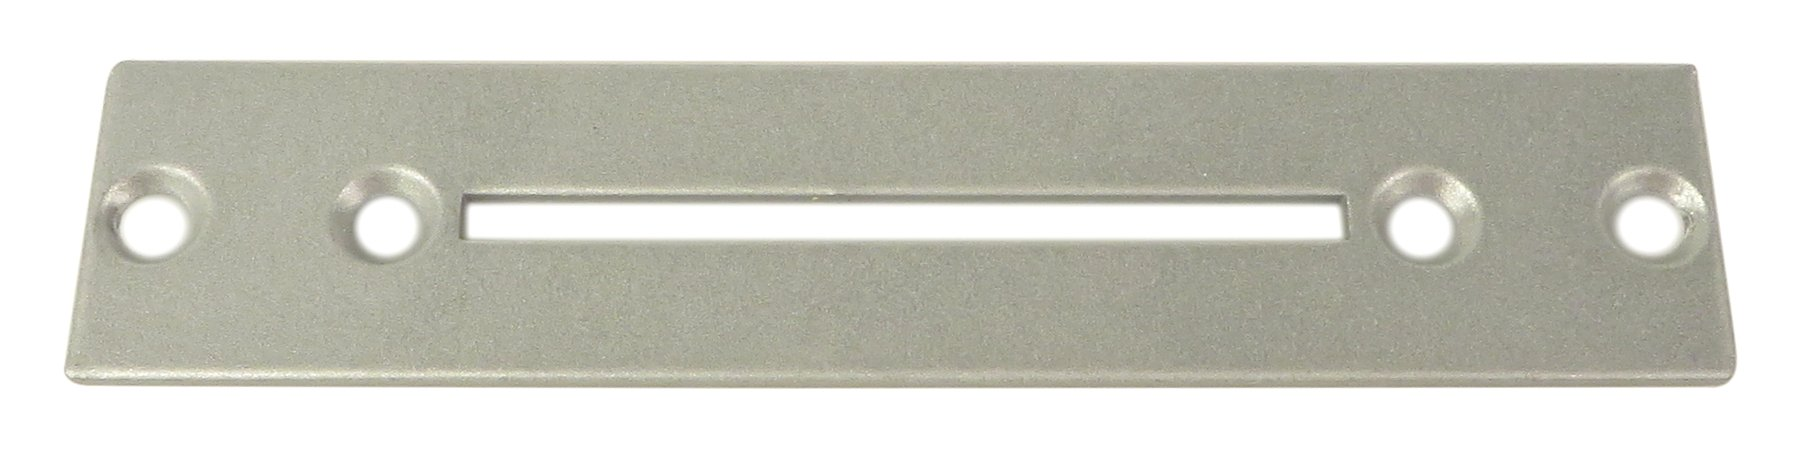 Sliver Crossfader Plate for XONE:92